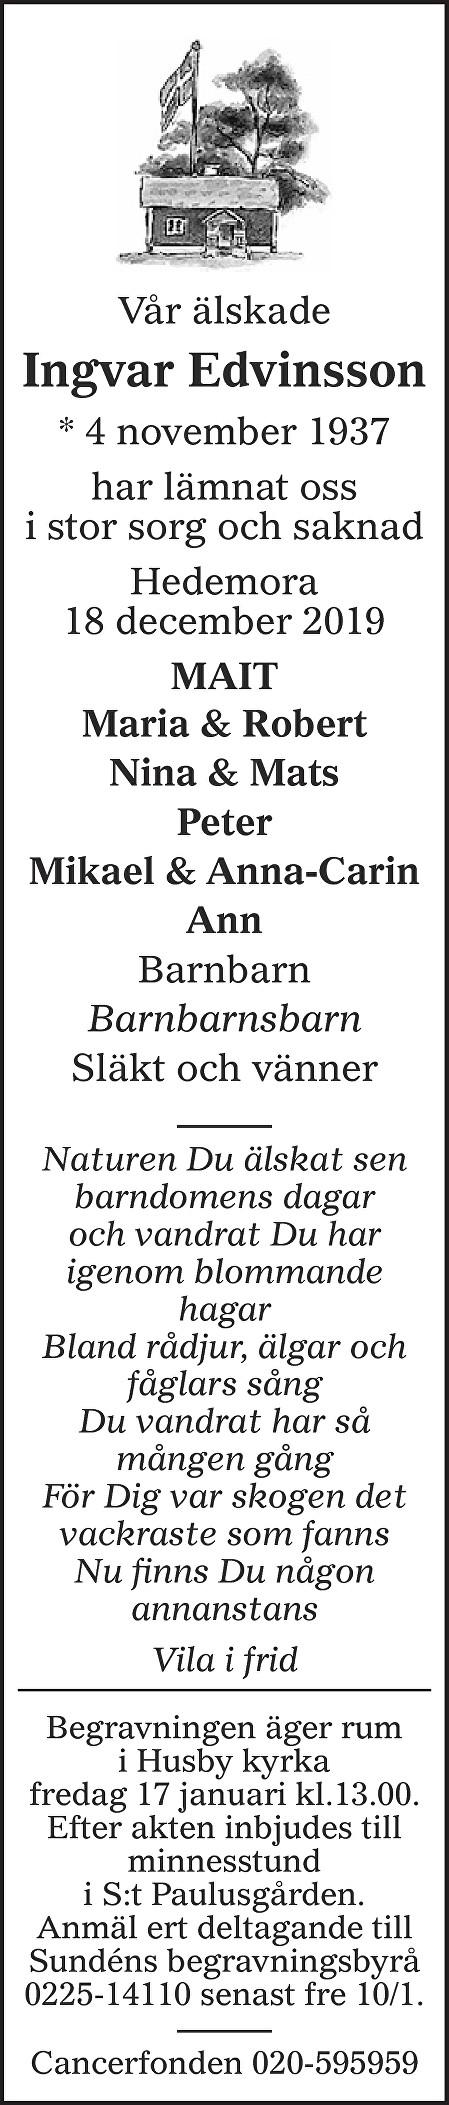 Ingvar Edvinsson Death notice